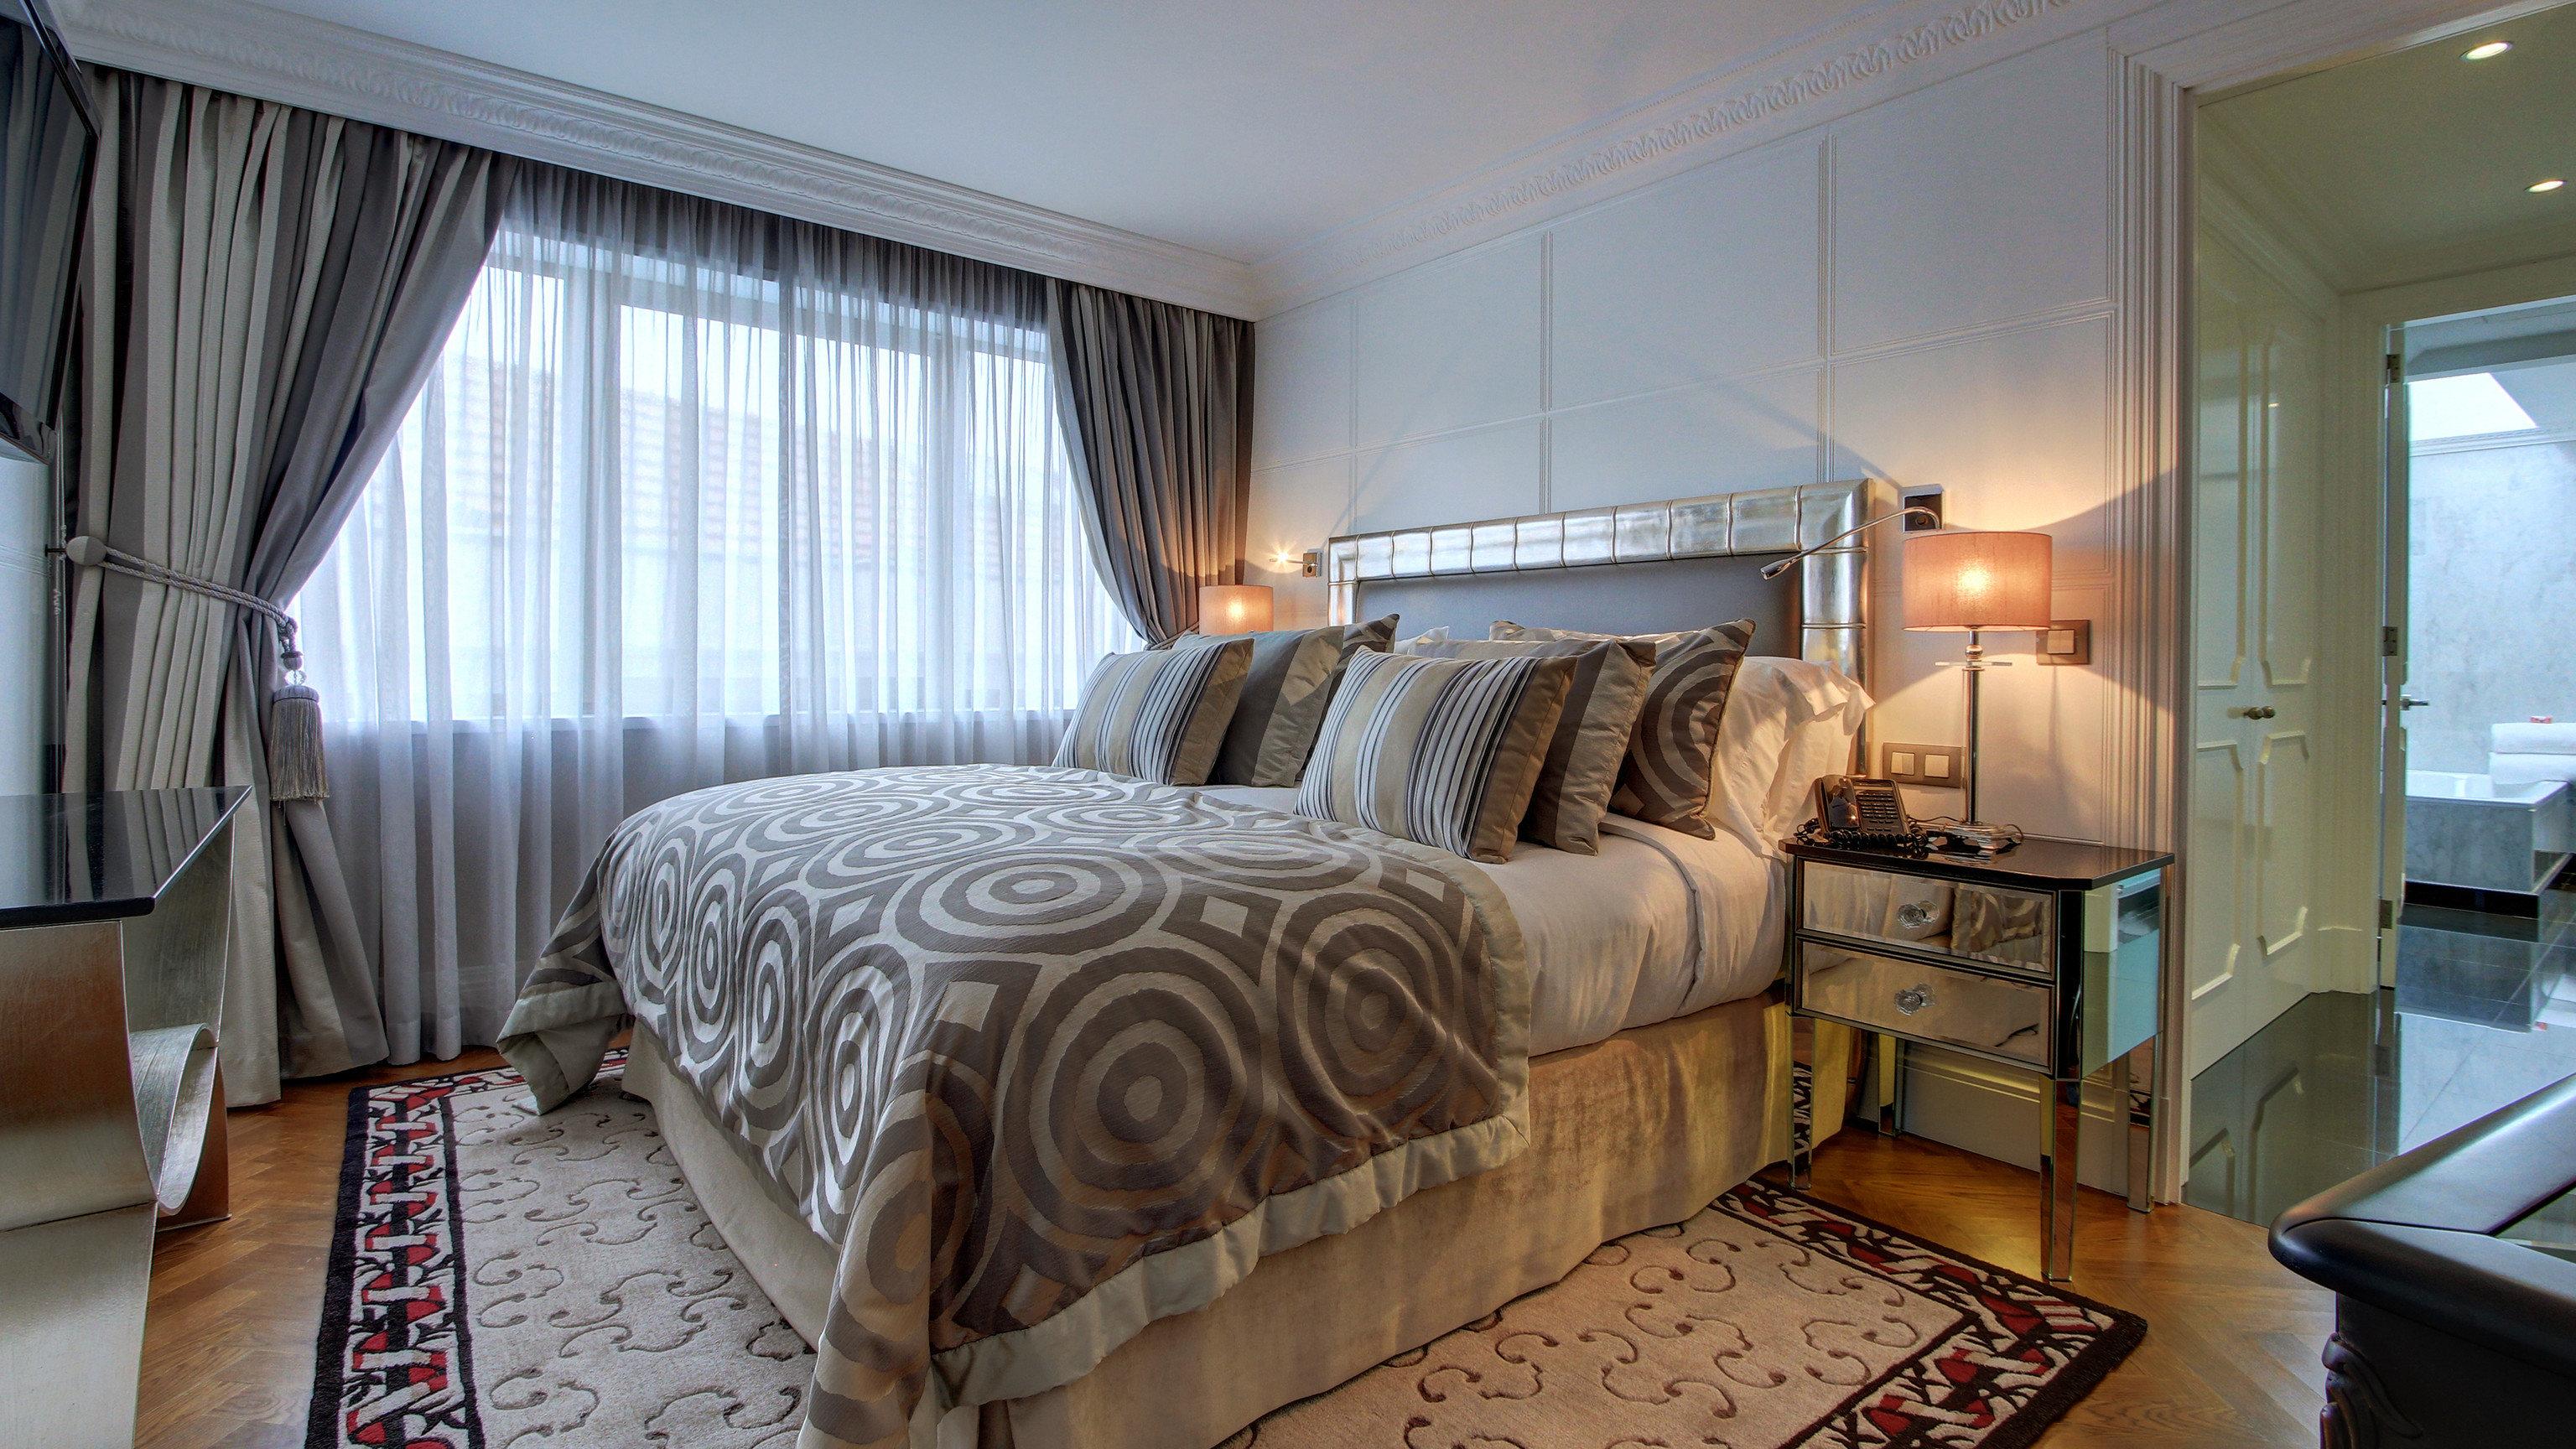 sofa property Bedroom home living room condominium cottage Suite